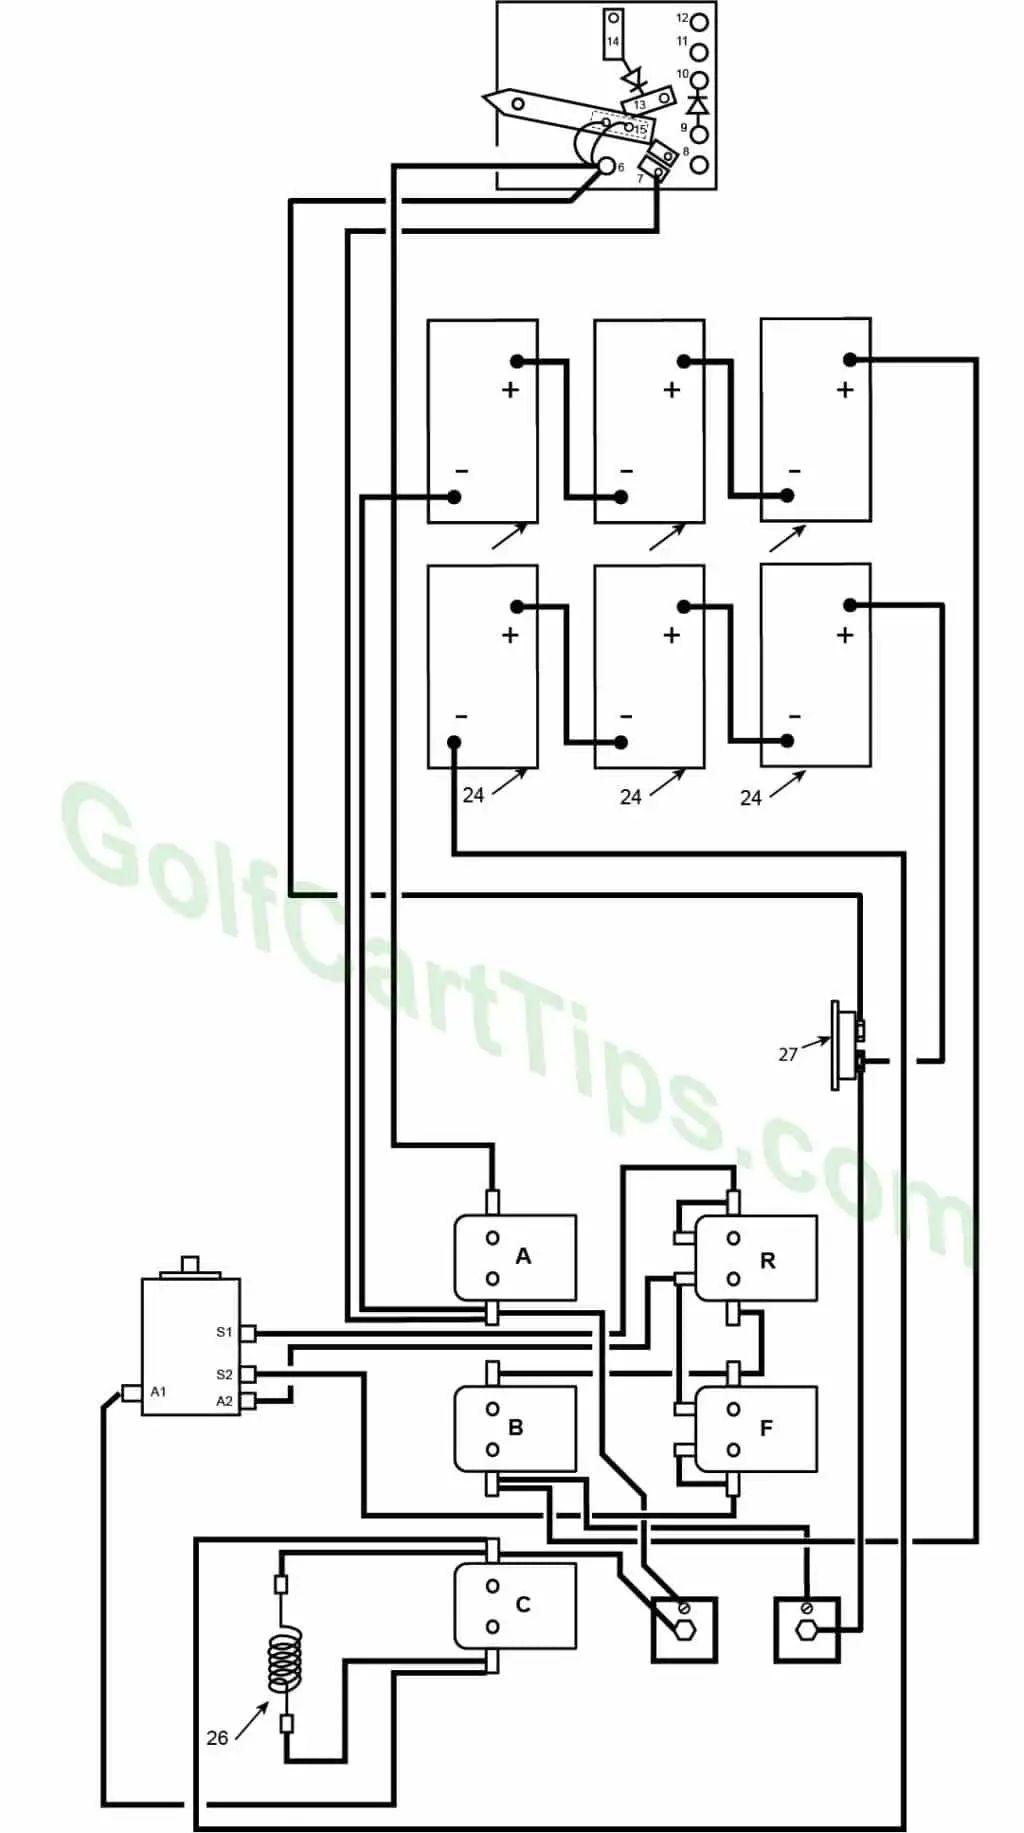 davidson ke light diagram wiring diagram schematic